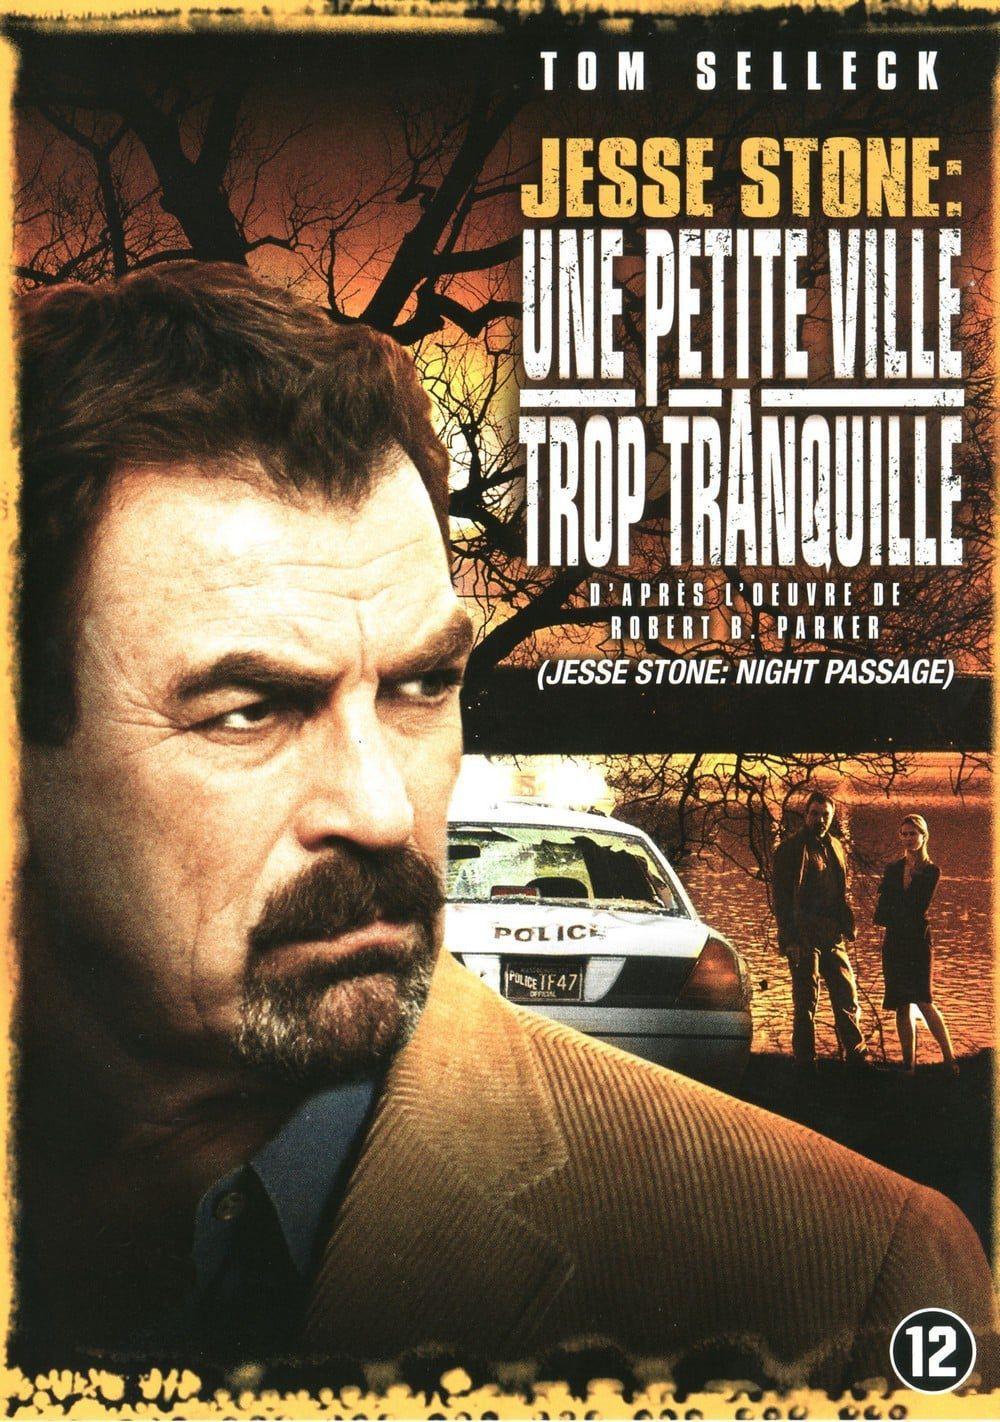 JESSE STONE : UNE PETITE VILLE BIEN TRANQUILLE (Jesse Stone : Night passage)